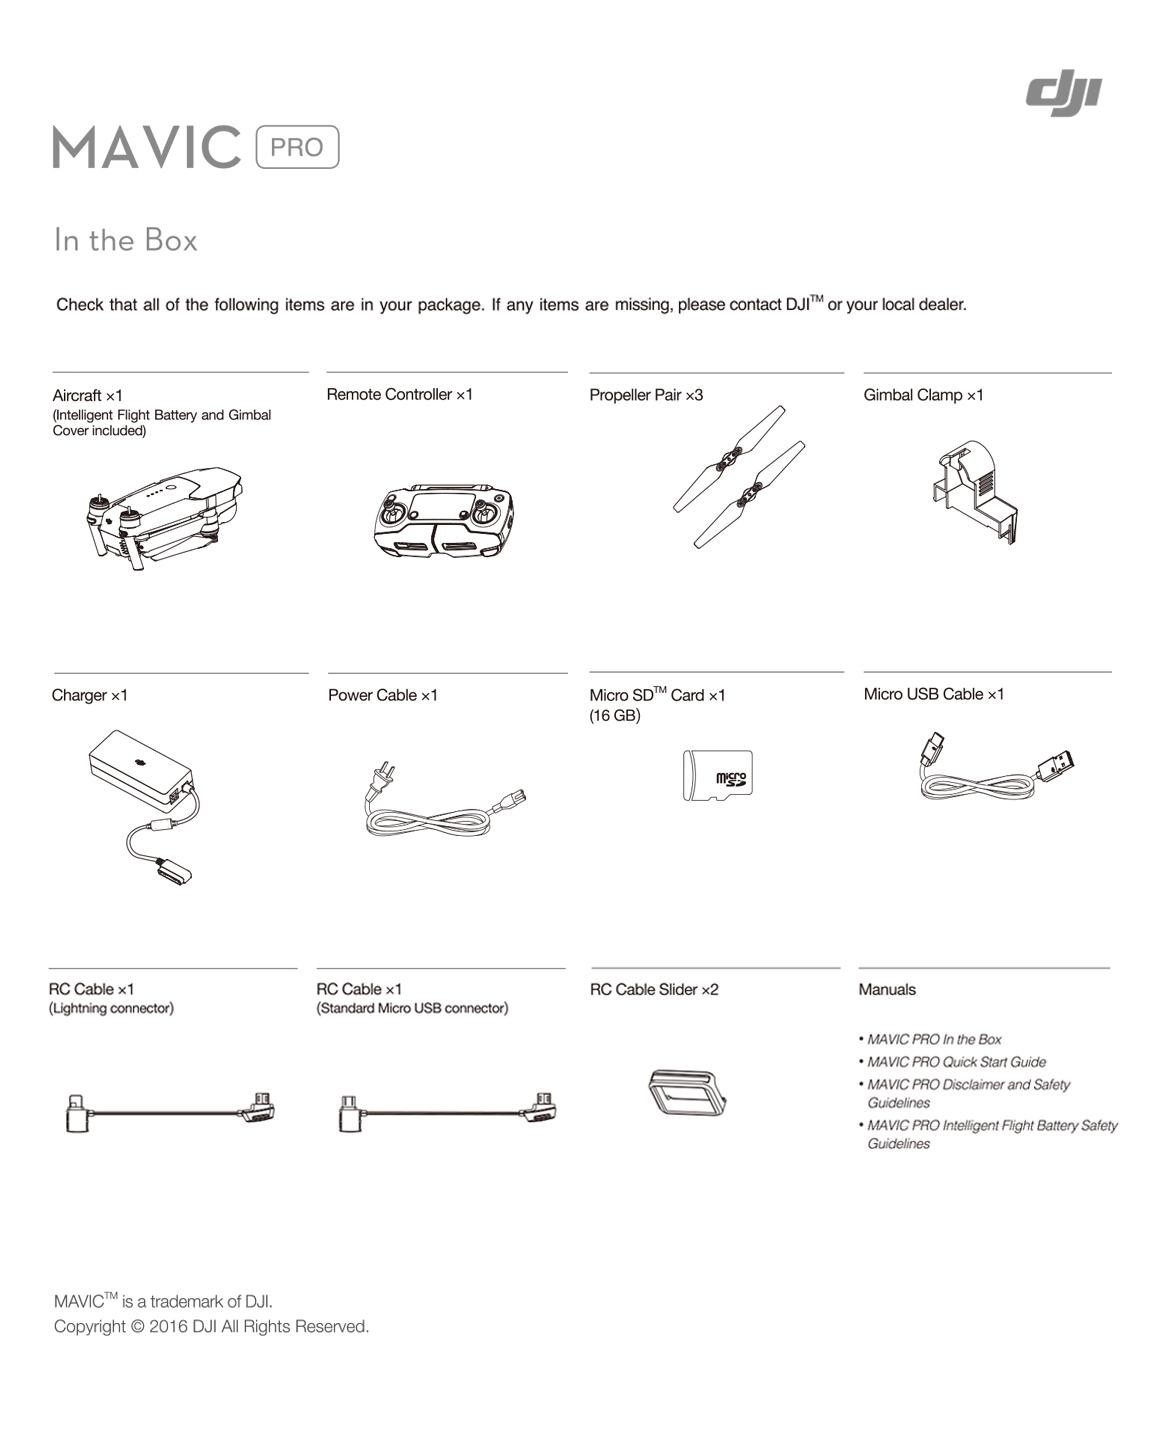 Contenido Caja Mavic Pro